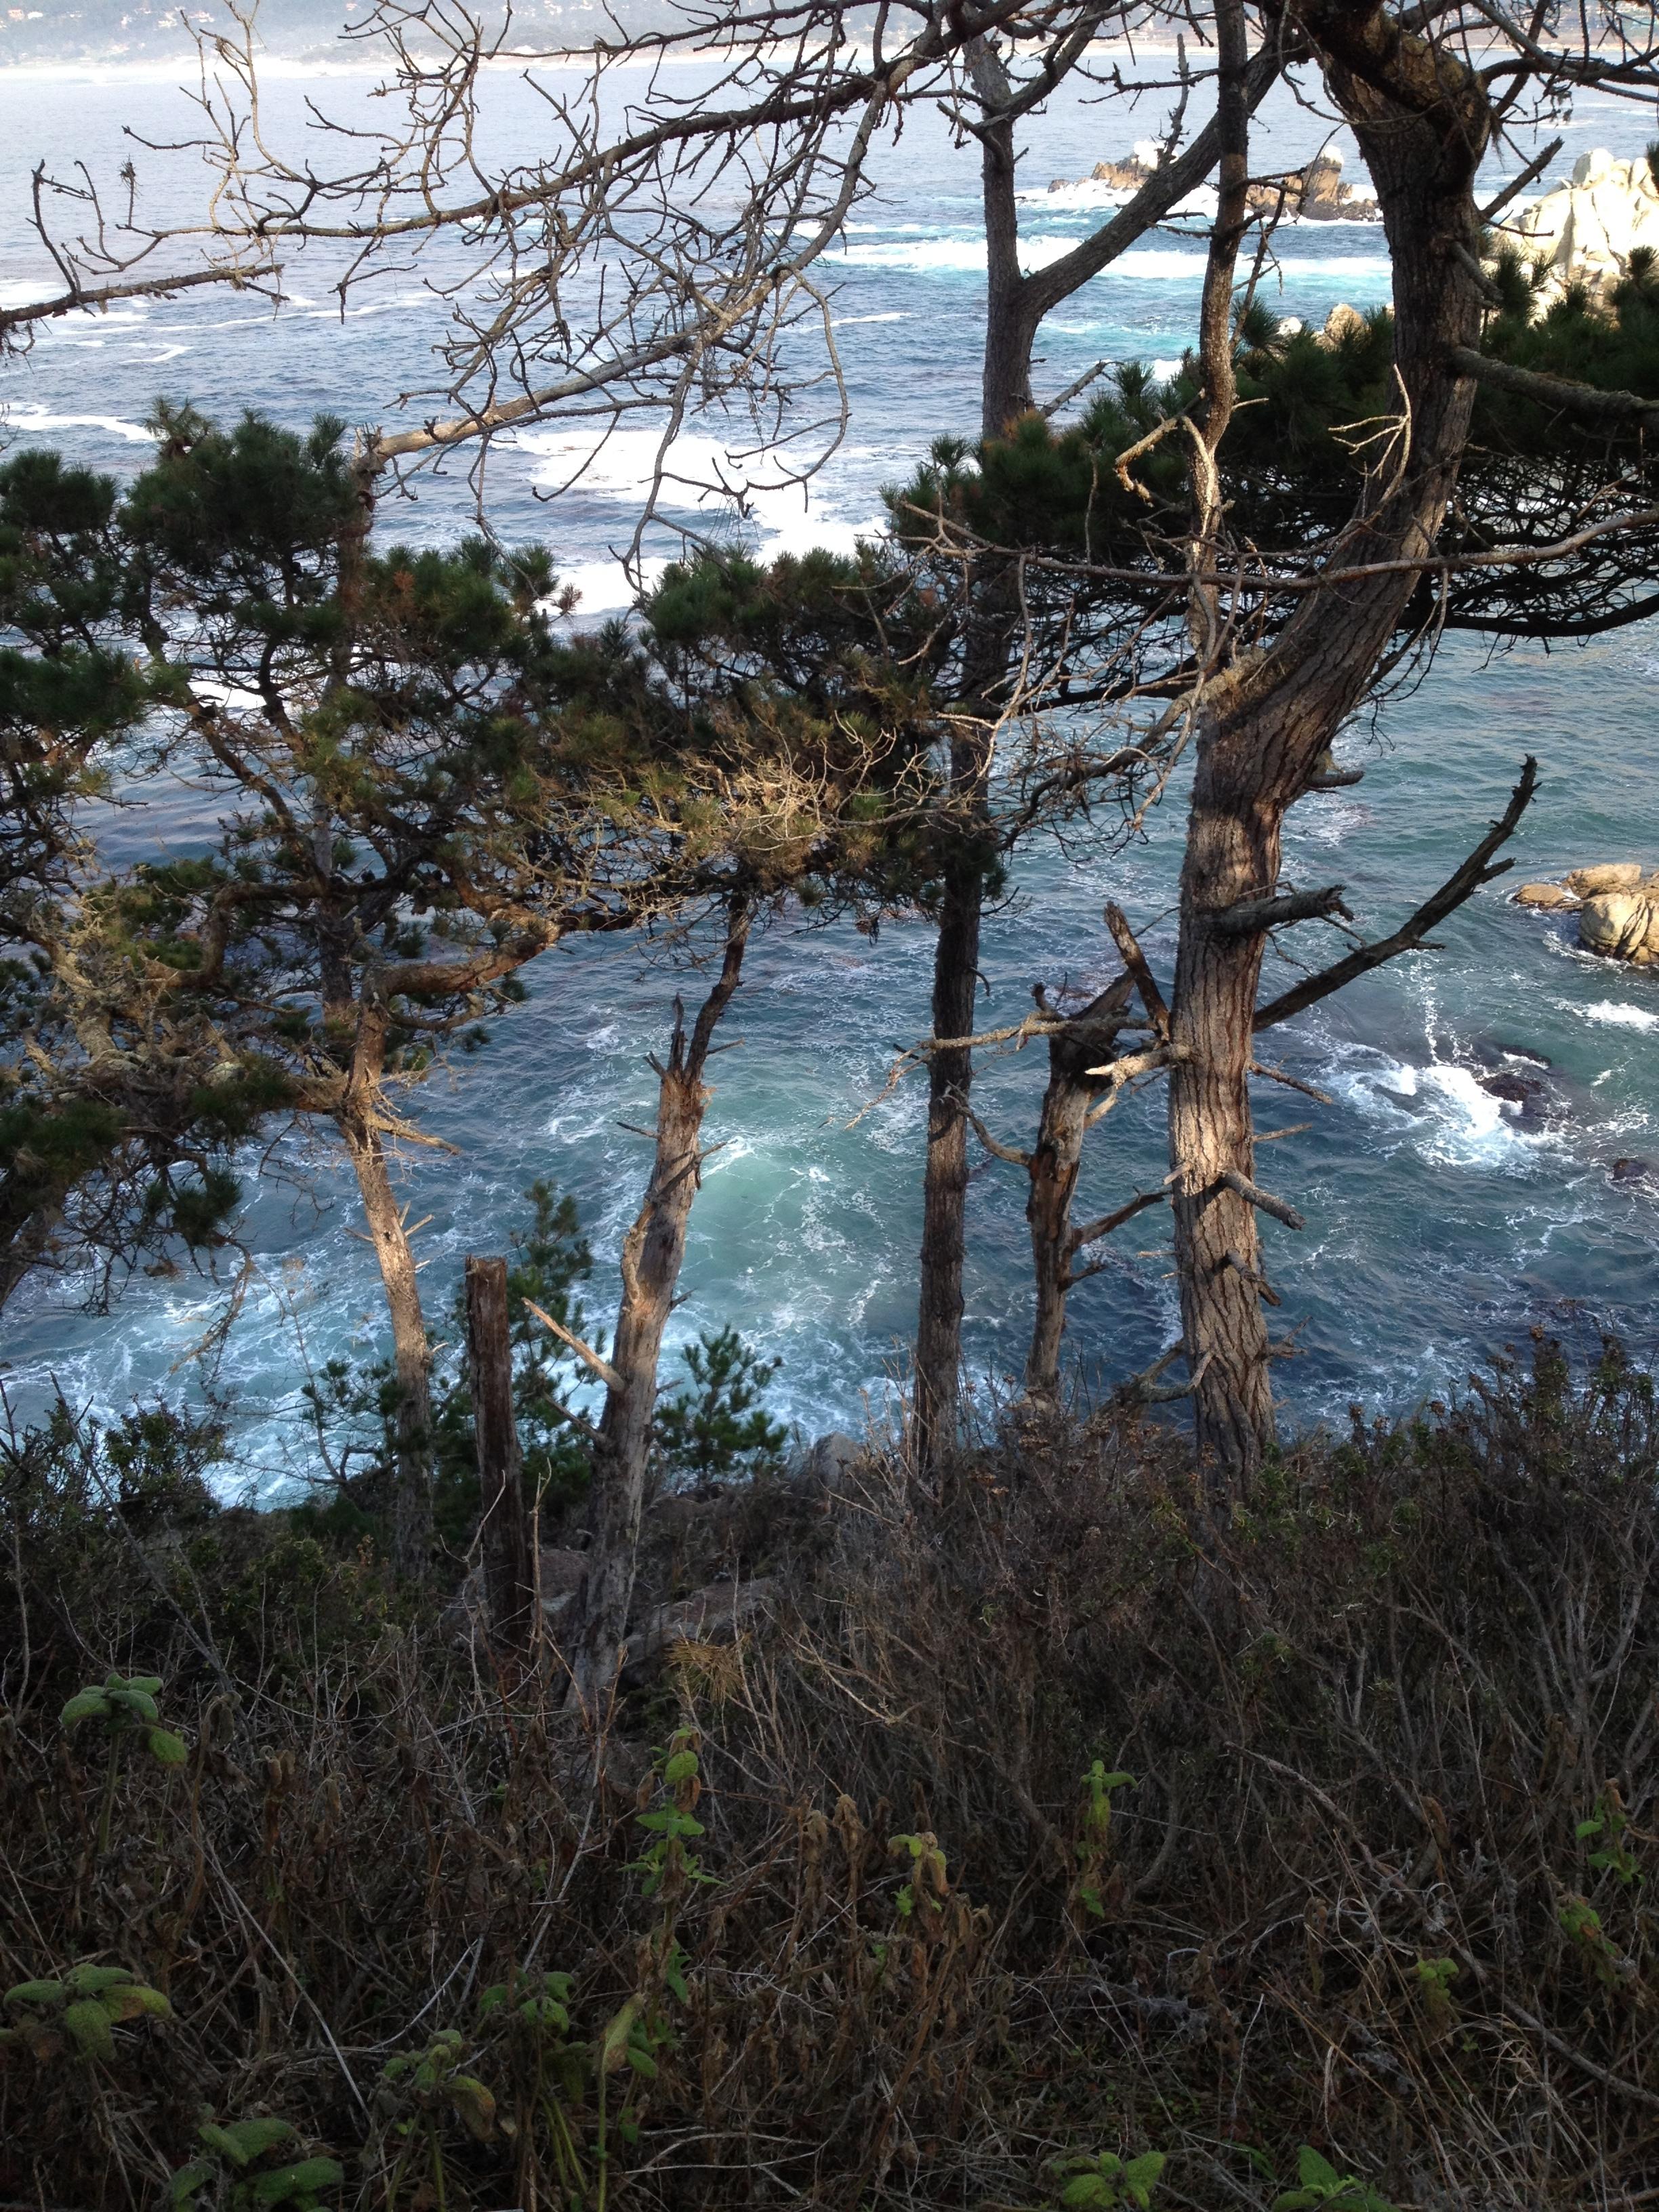 Point Lobos, CA - November 2015